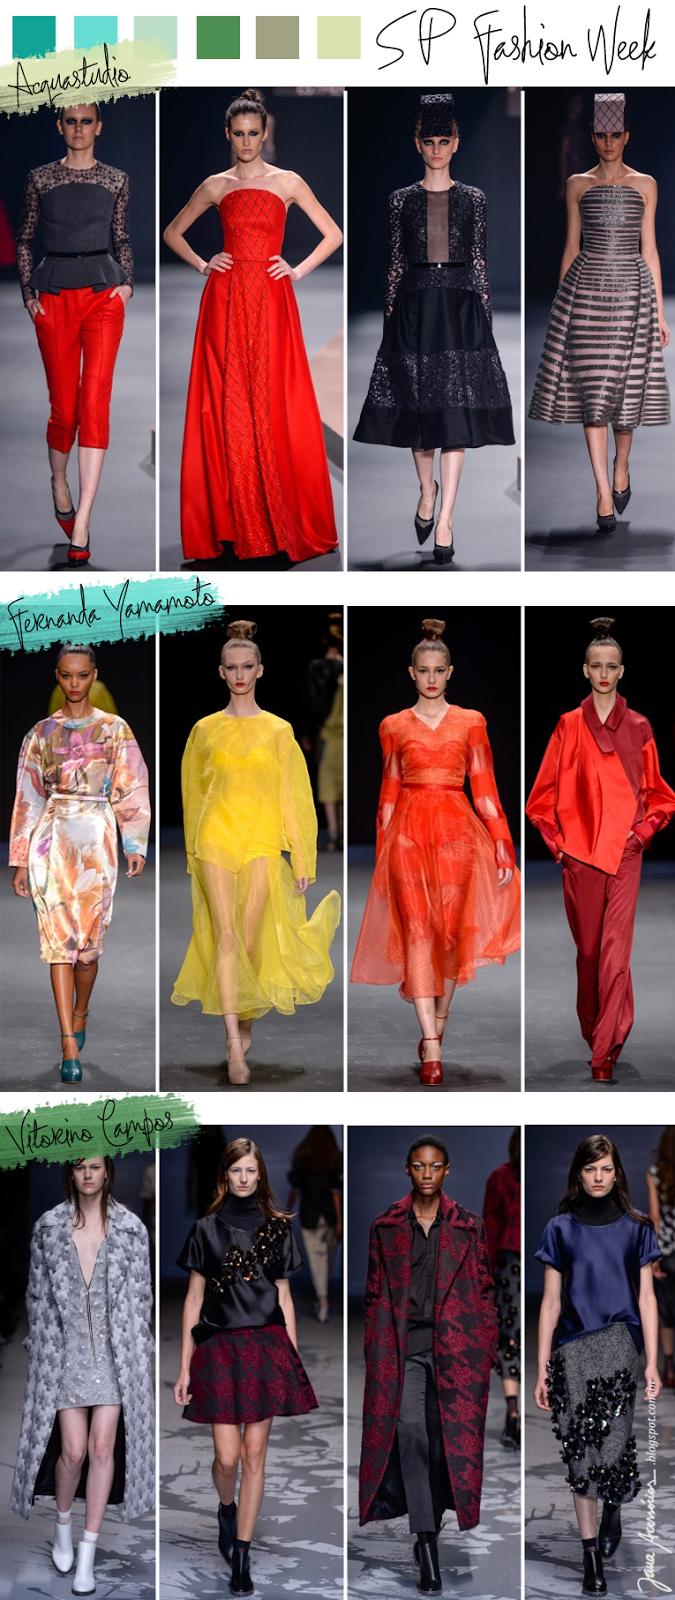 Moda, Estilo, São Paulo Fashion Week, Blog da Jana, Jana Acessórios